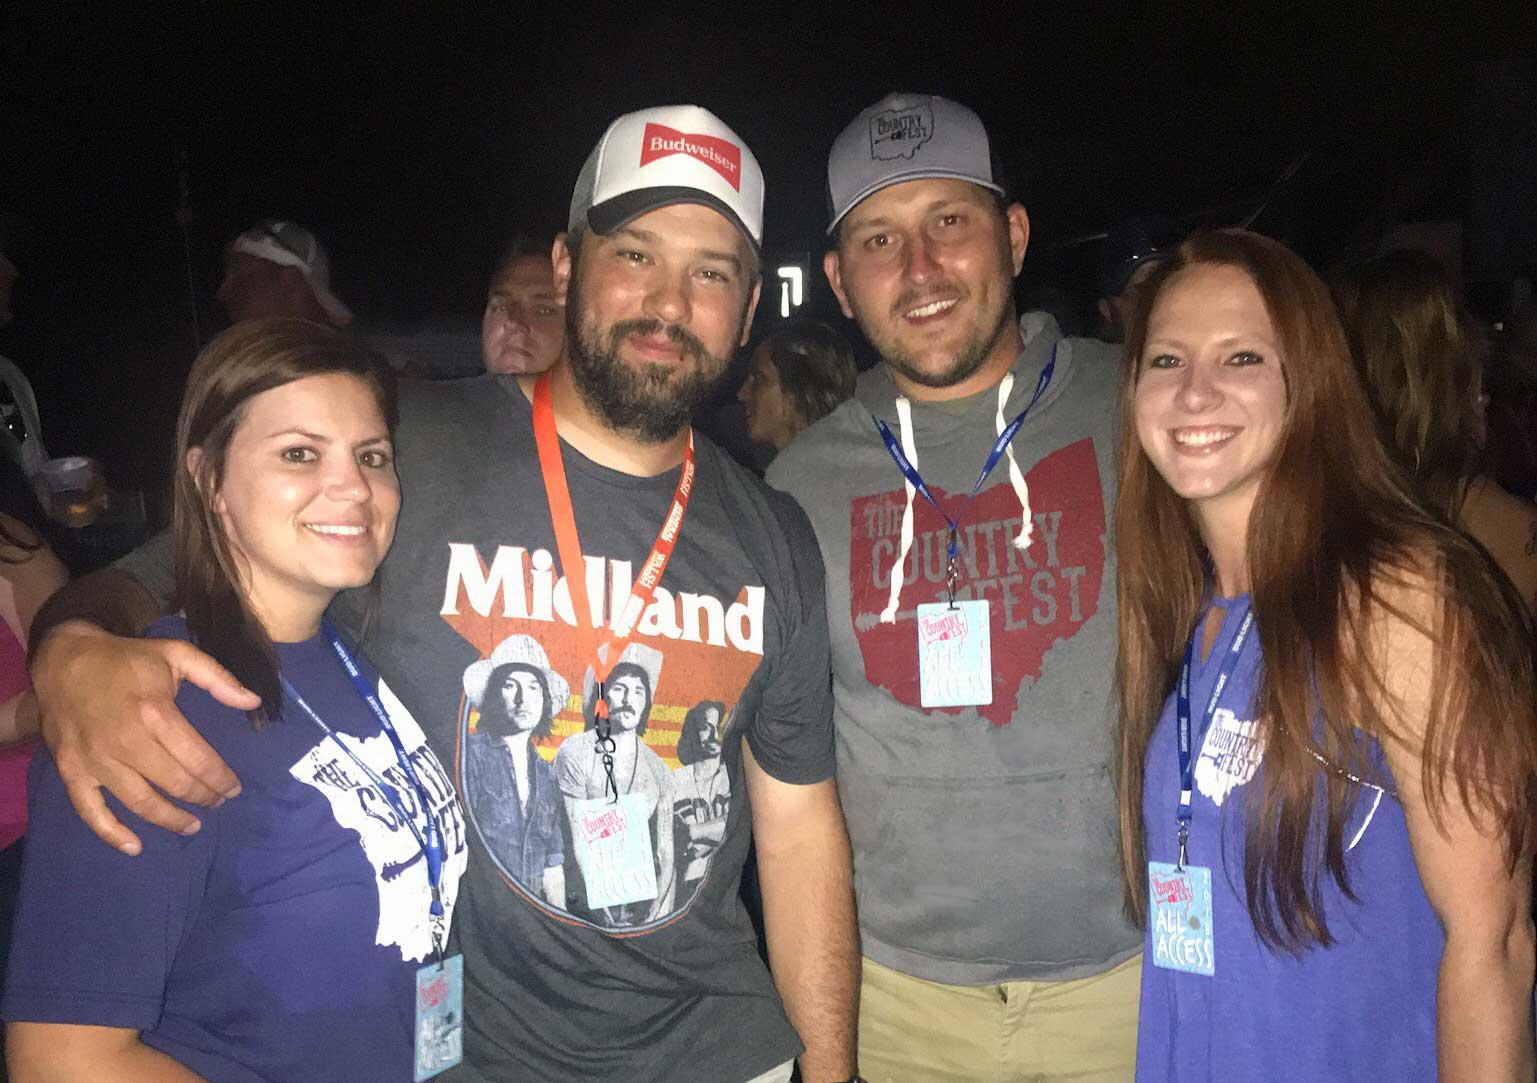 The Country Fest Ohio Team